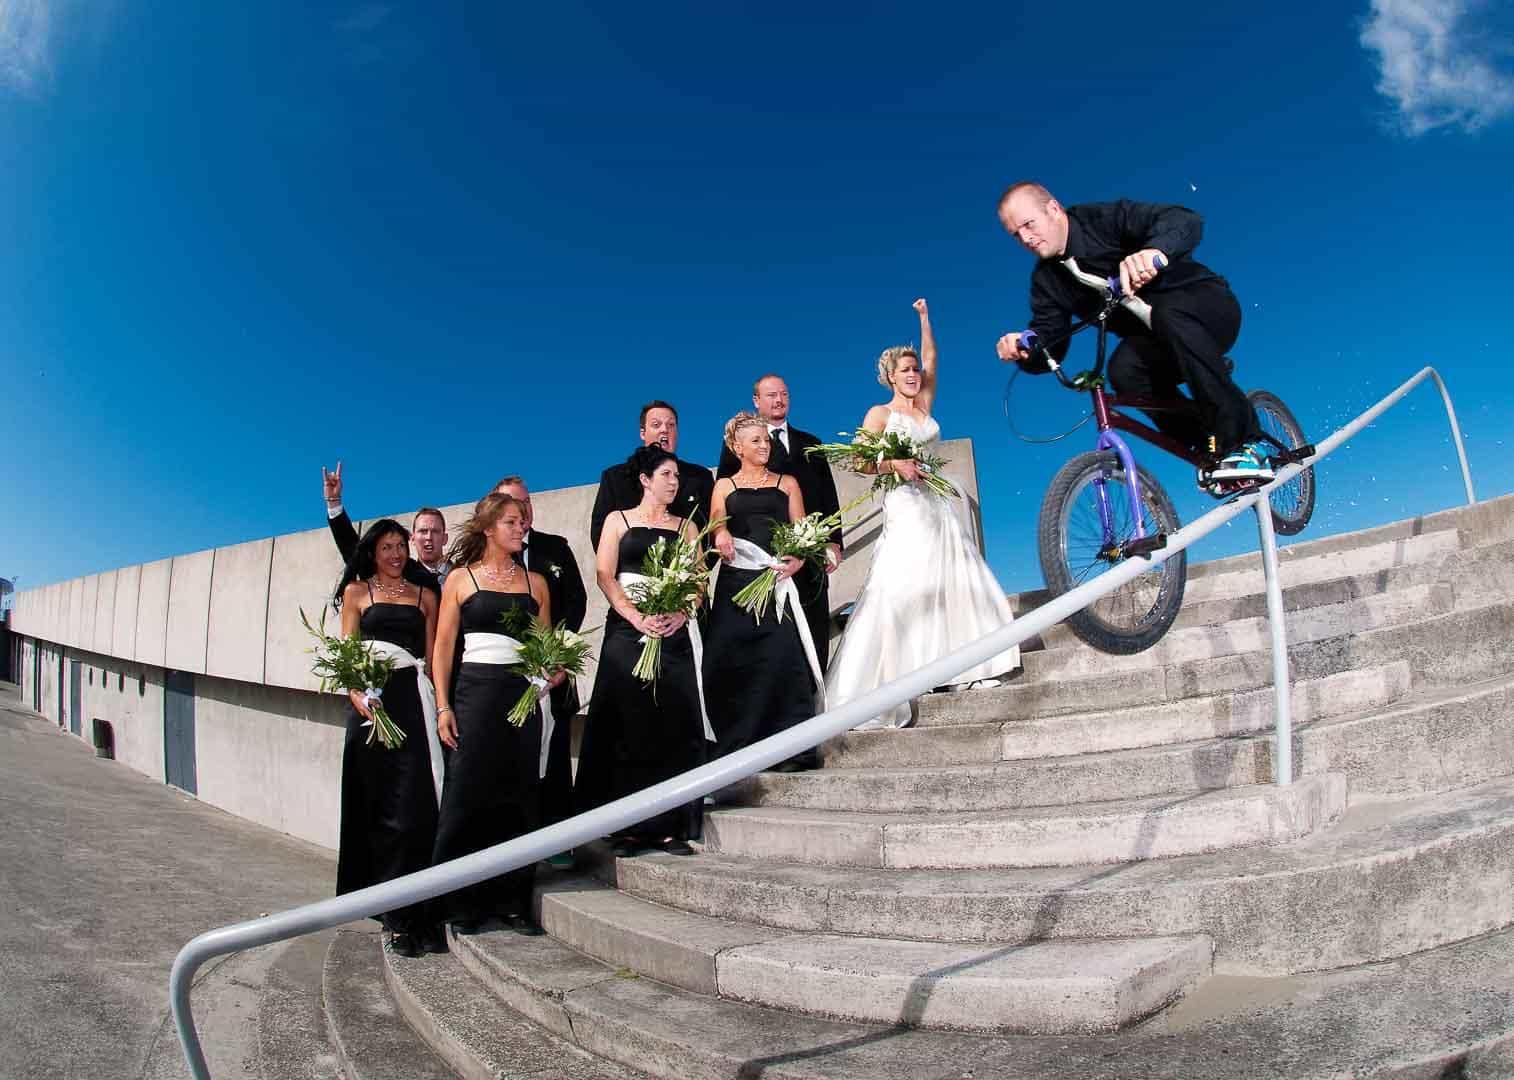 Christchurch wedding groom bmx rail bicycle bridal party extreme wedding photos 20100220-BRAD&JO-DSC_0039colourP_1920